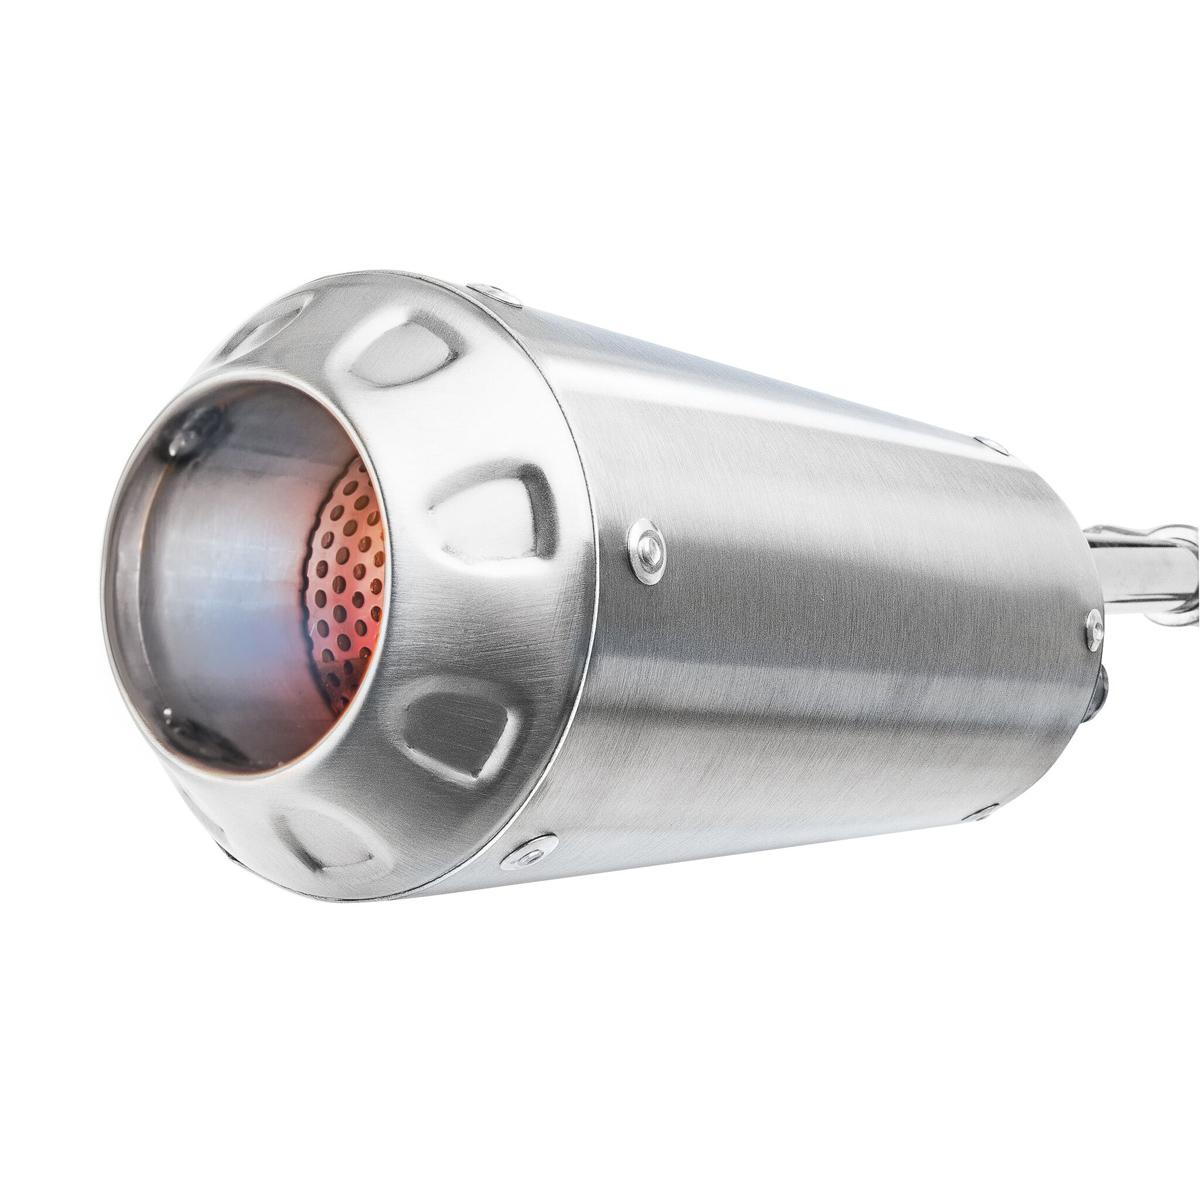 Hotbodies MGP II Universal Stainless Slip-On Exhaust